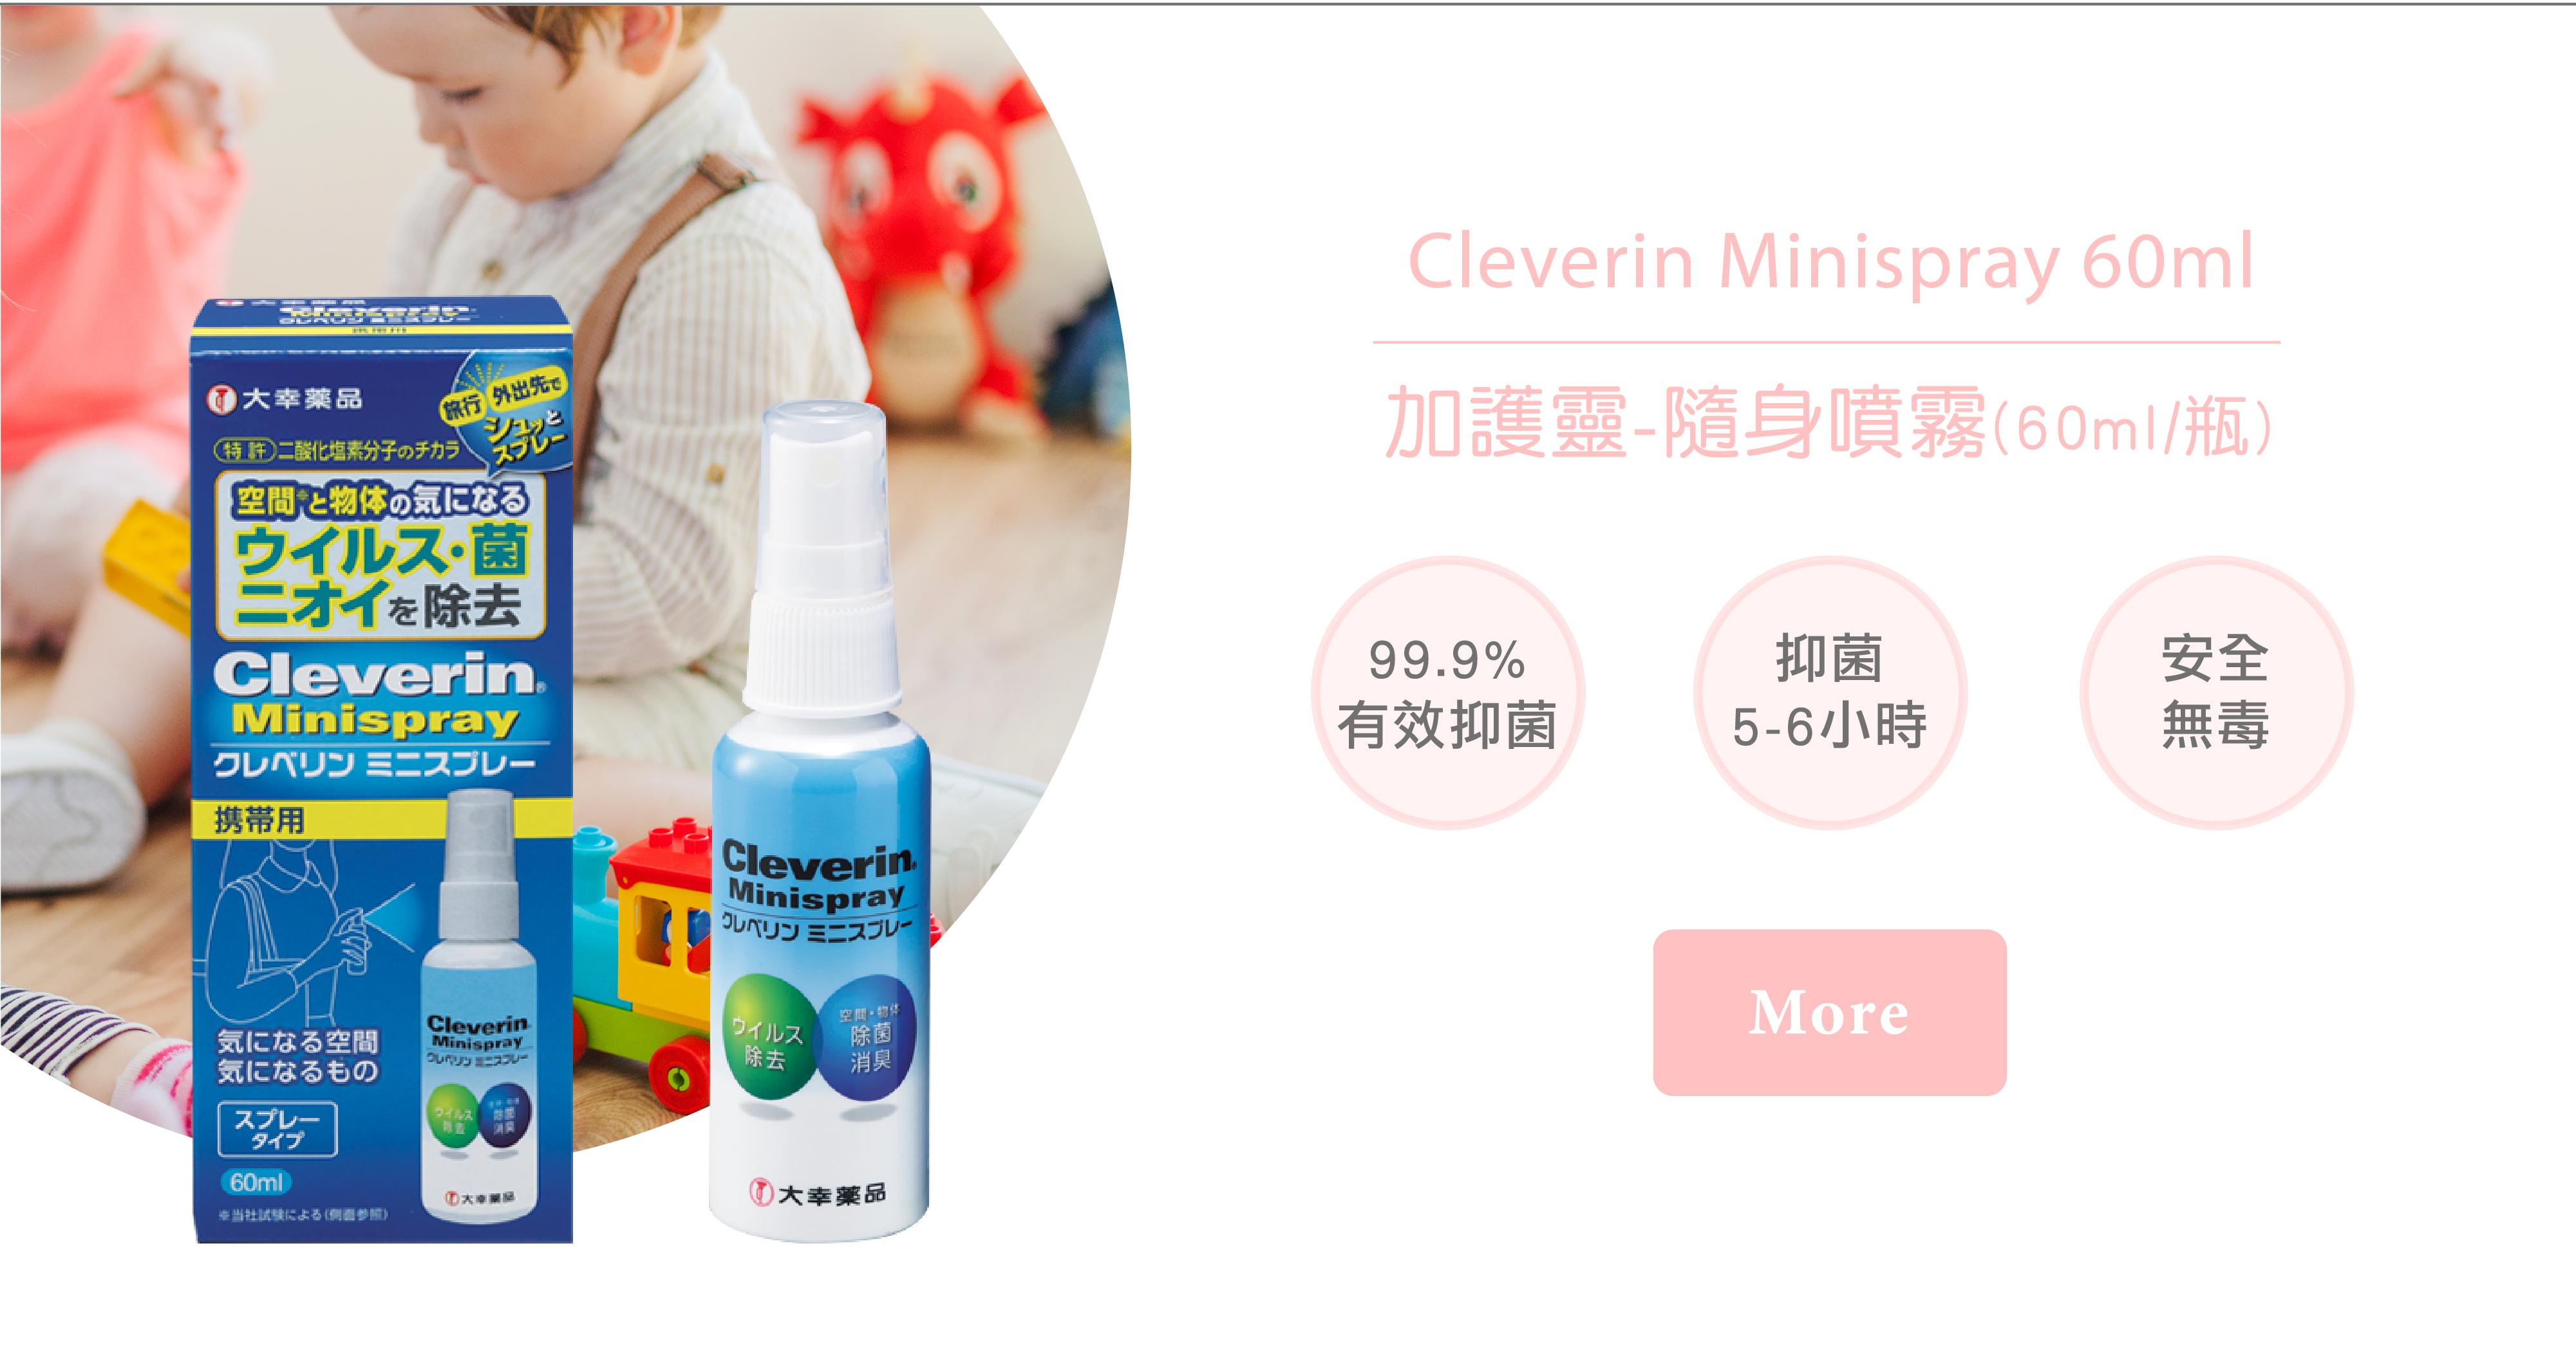 cleverin minispray 加護靈 隨身噴霧 60ml